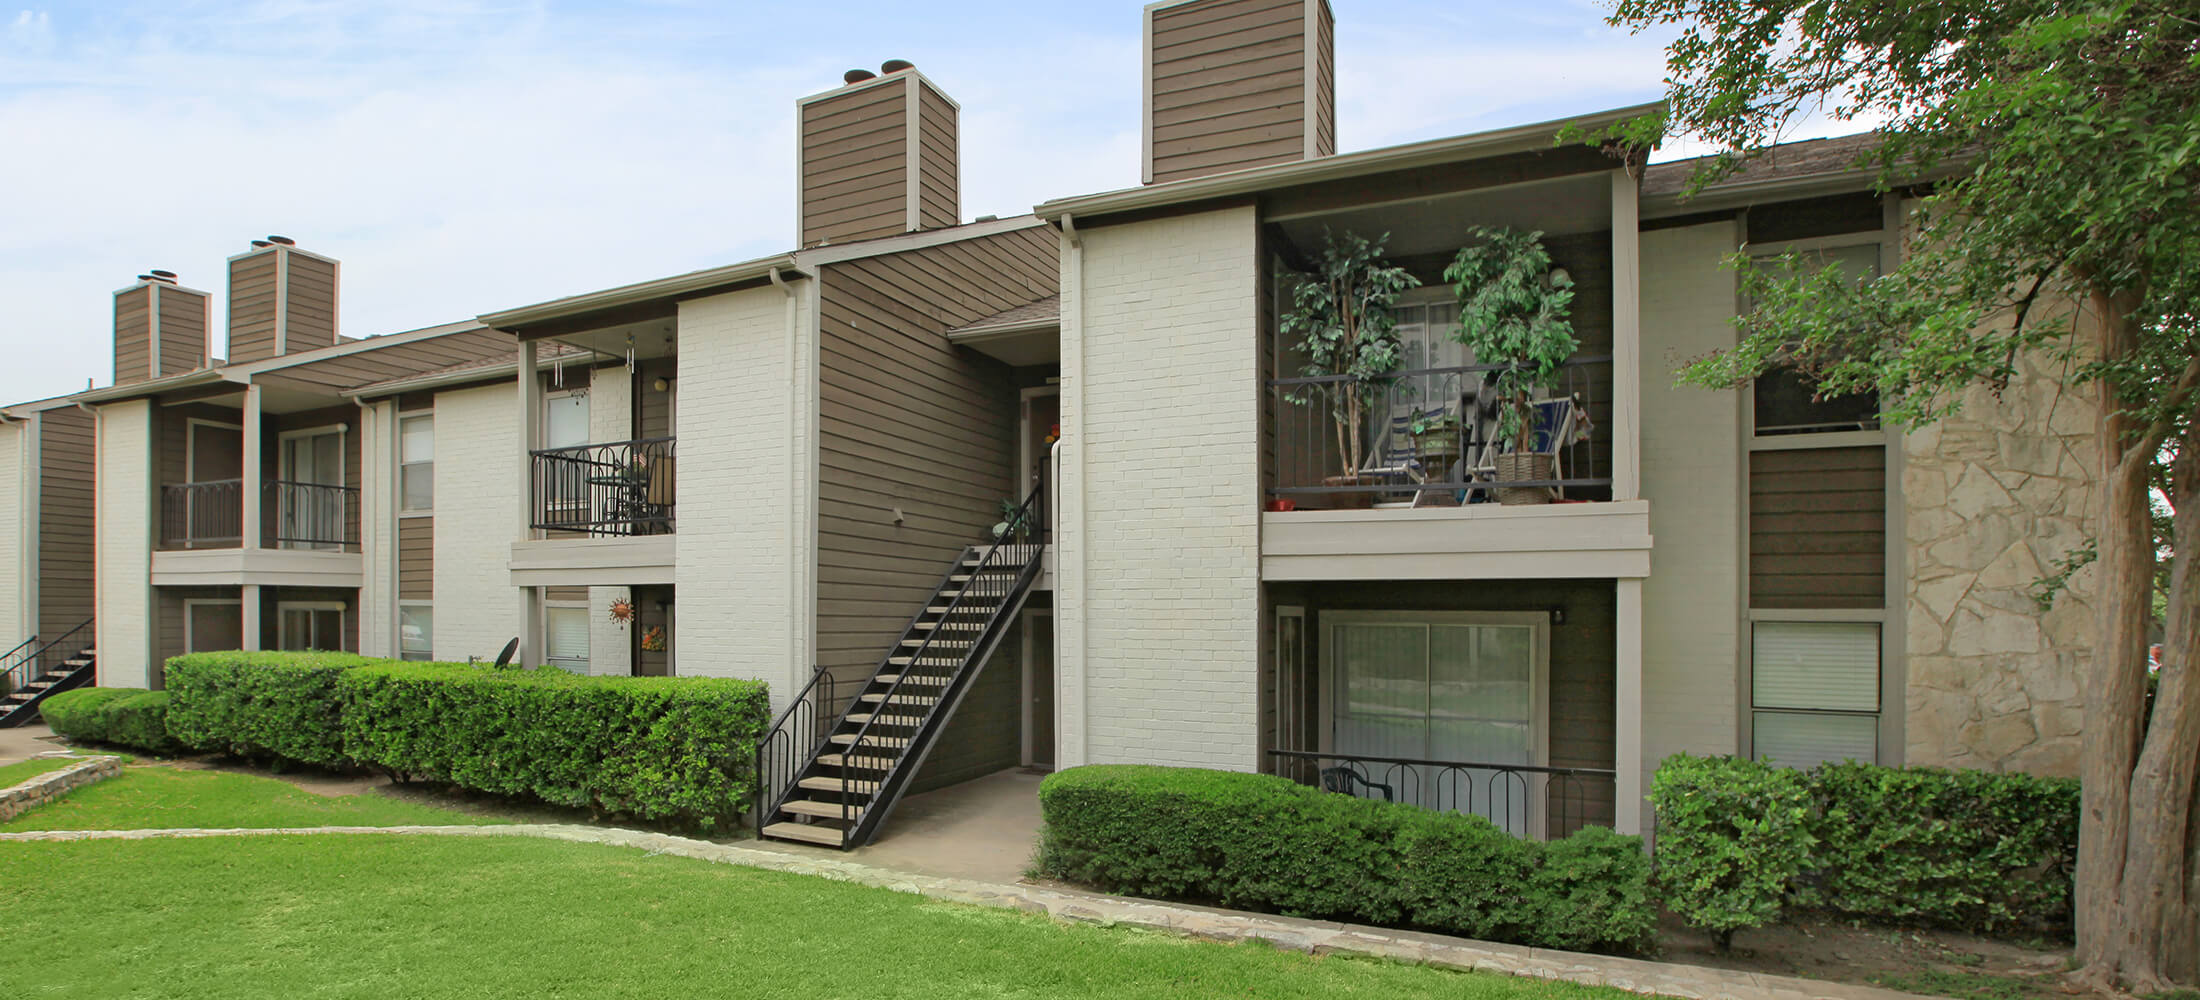 Distinction Apartment Homes San Antonio